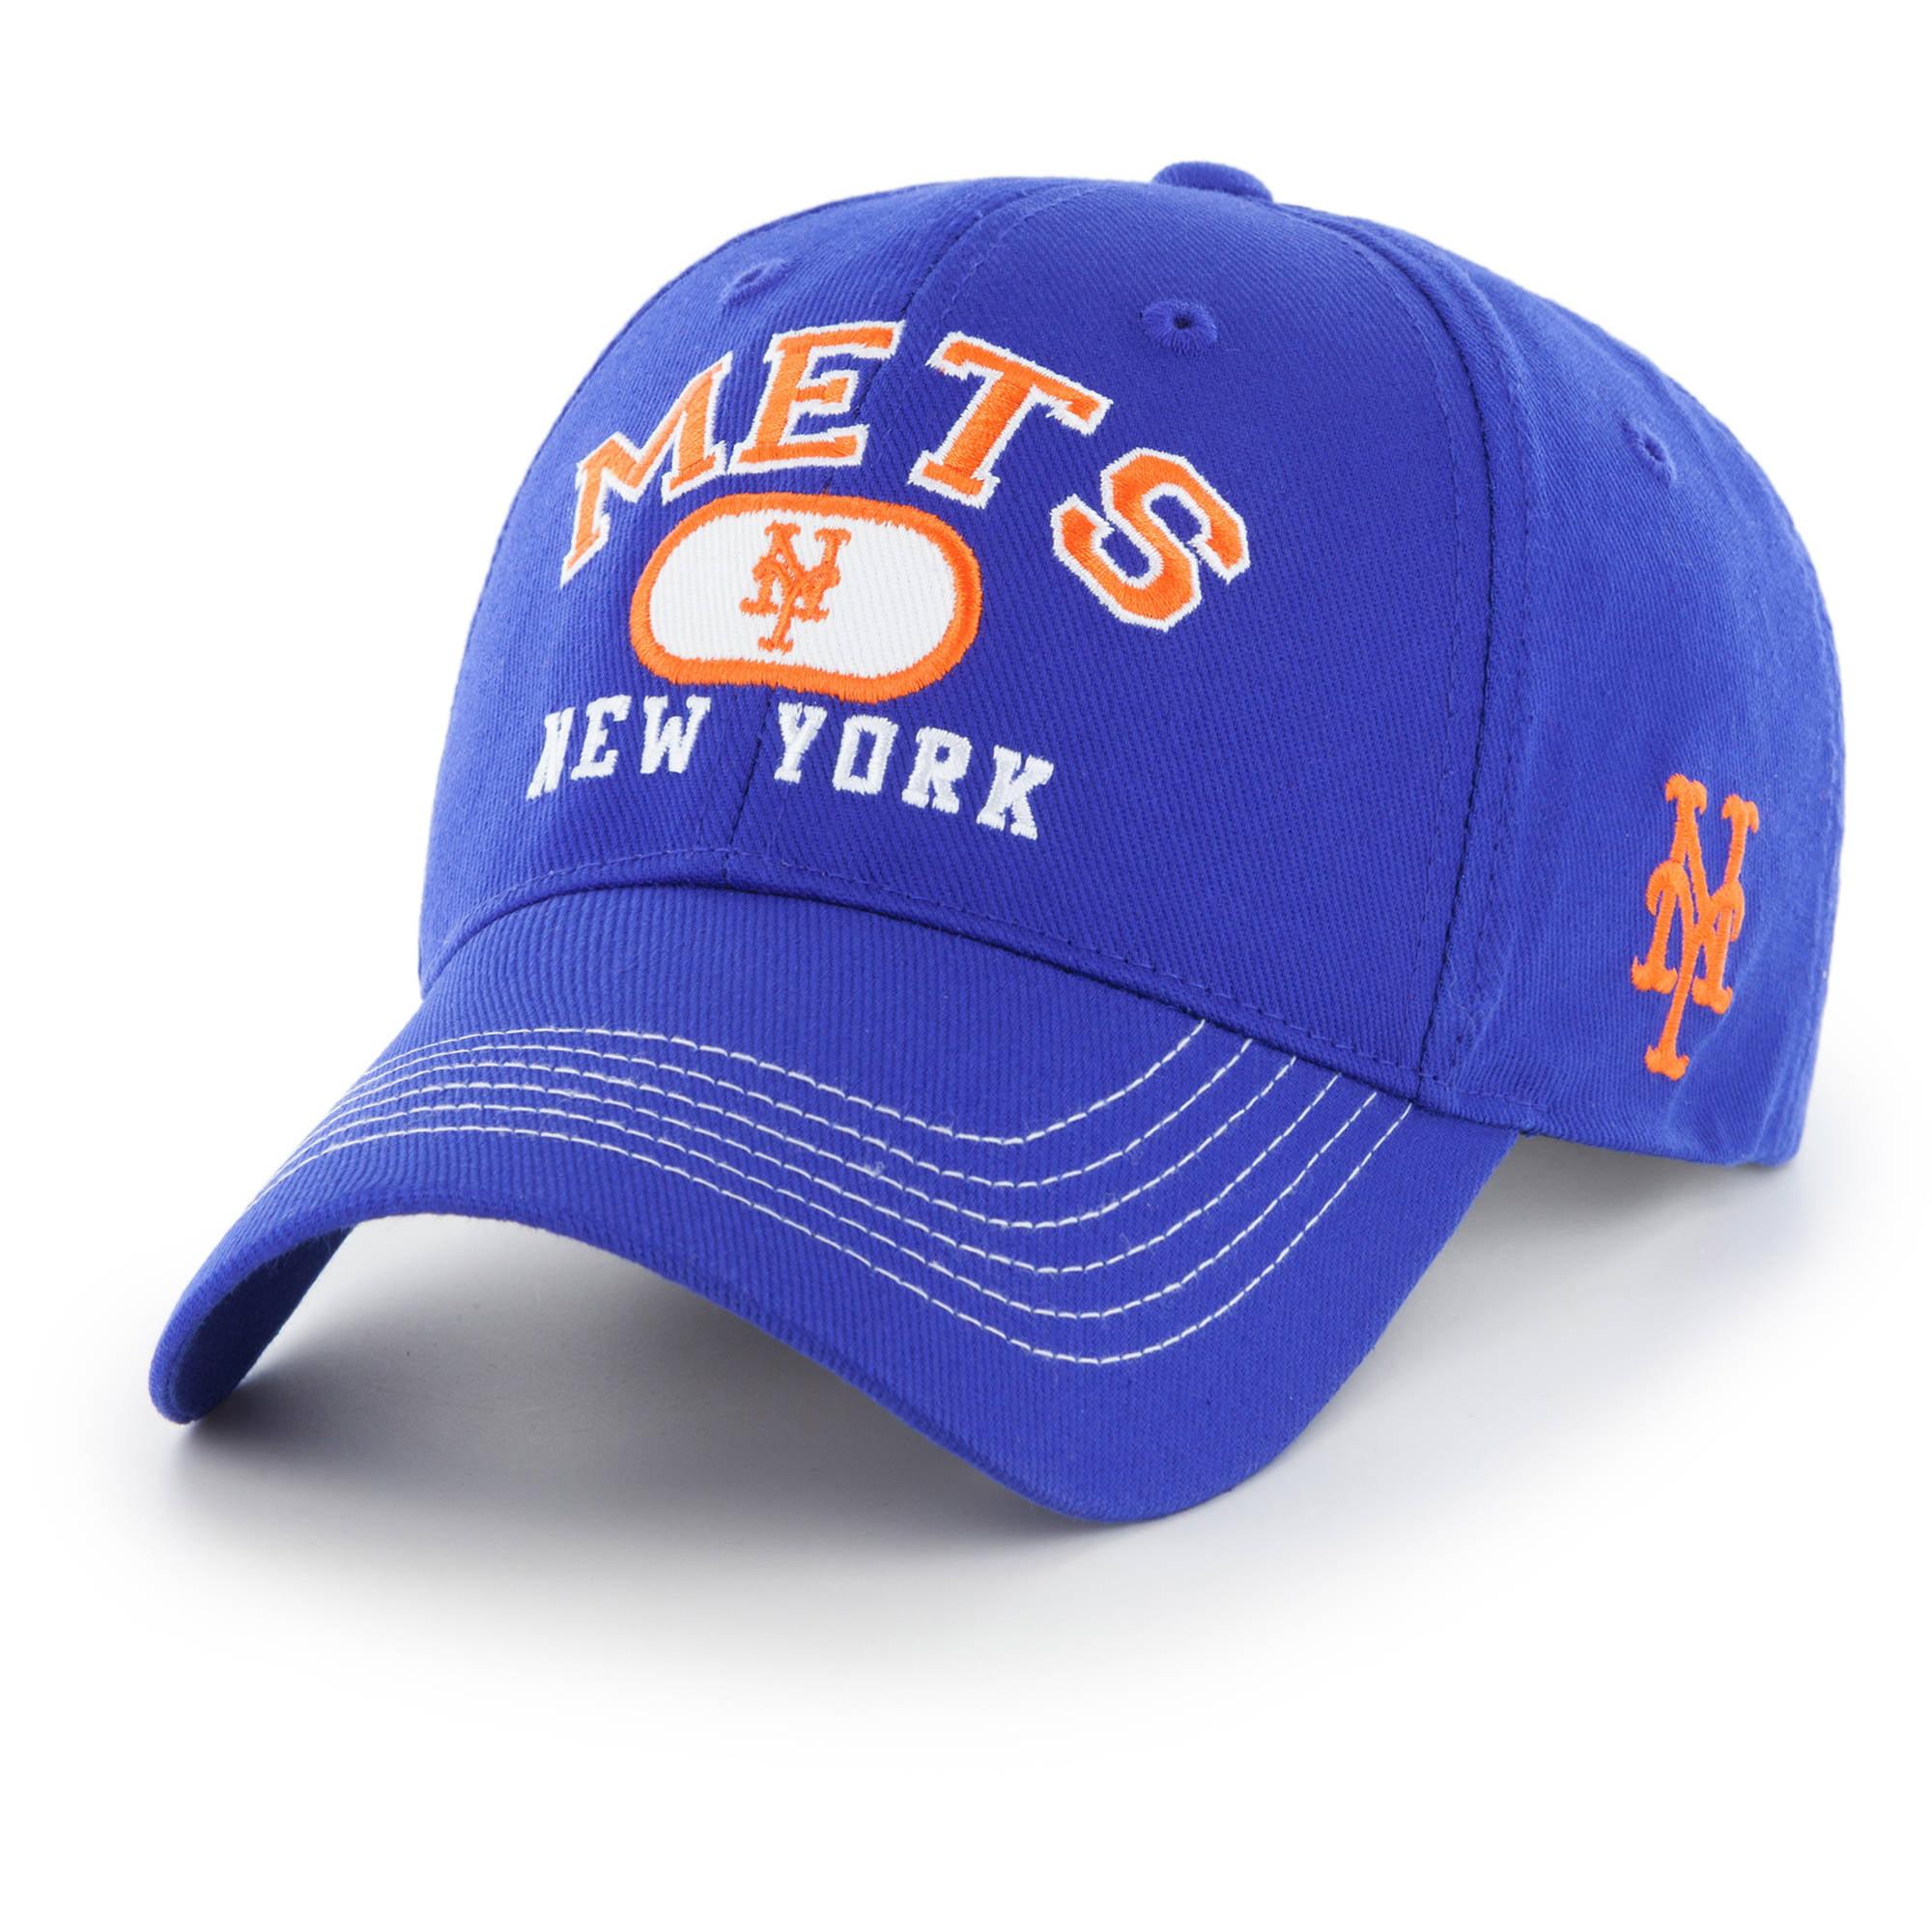 MLB New York Mets Draft Cap / Hat by Fan Favorite